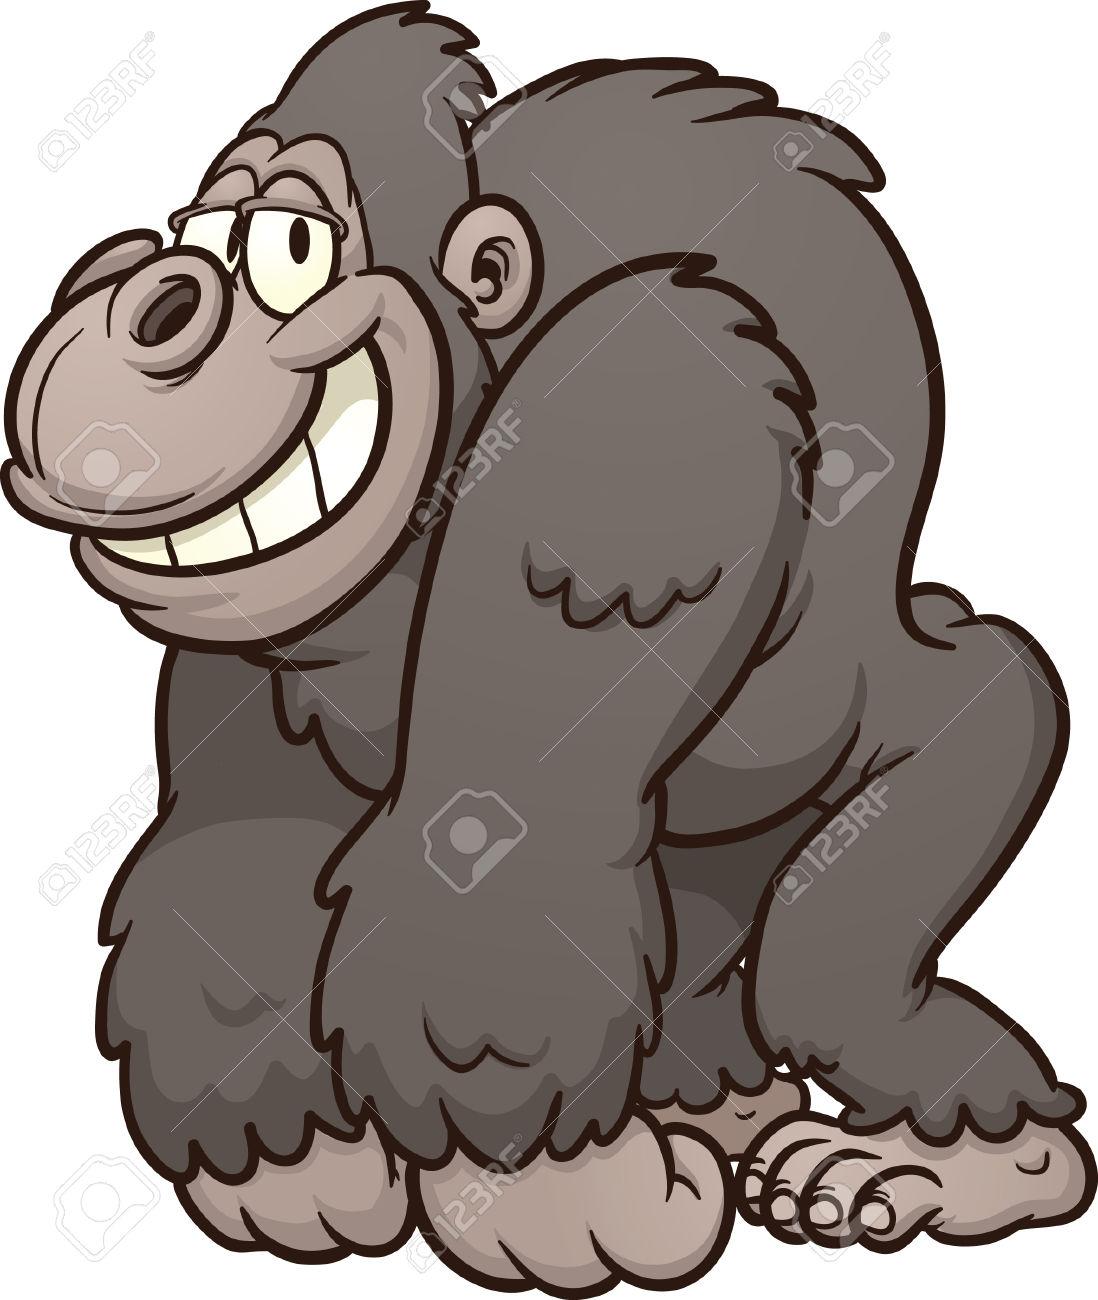 18,842 Gorilla Stock Vector Illustration And Royalty Free Gorilla.